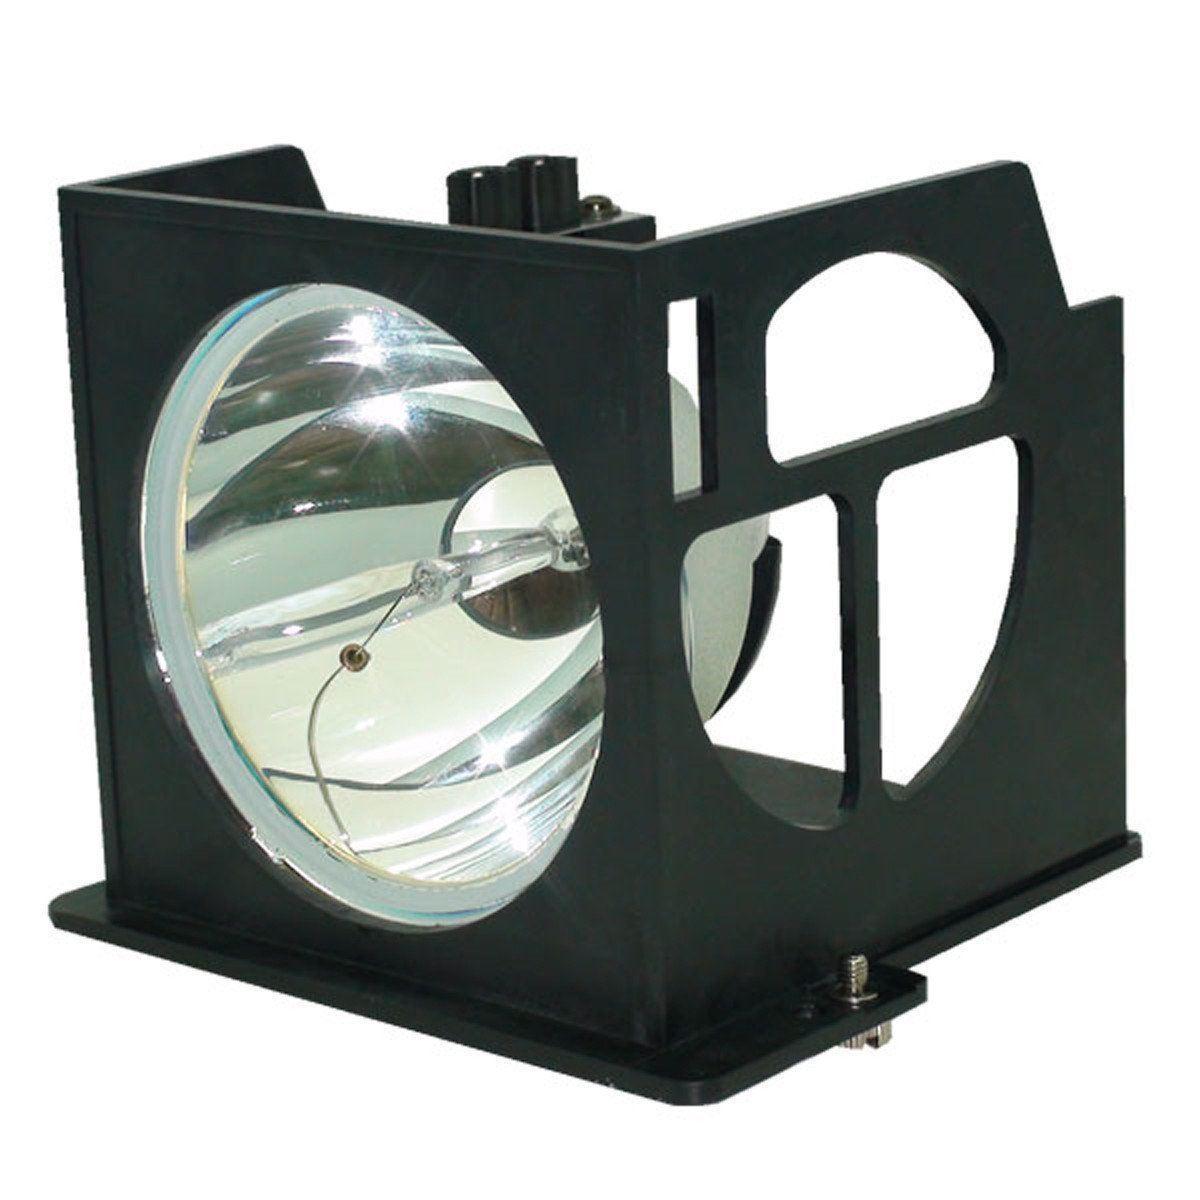 Gemstar GDT-56DRP Philips TV Lamp Module image 2